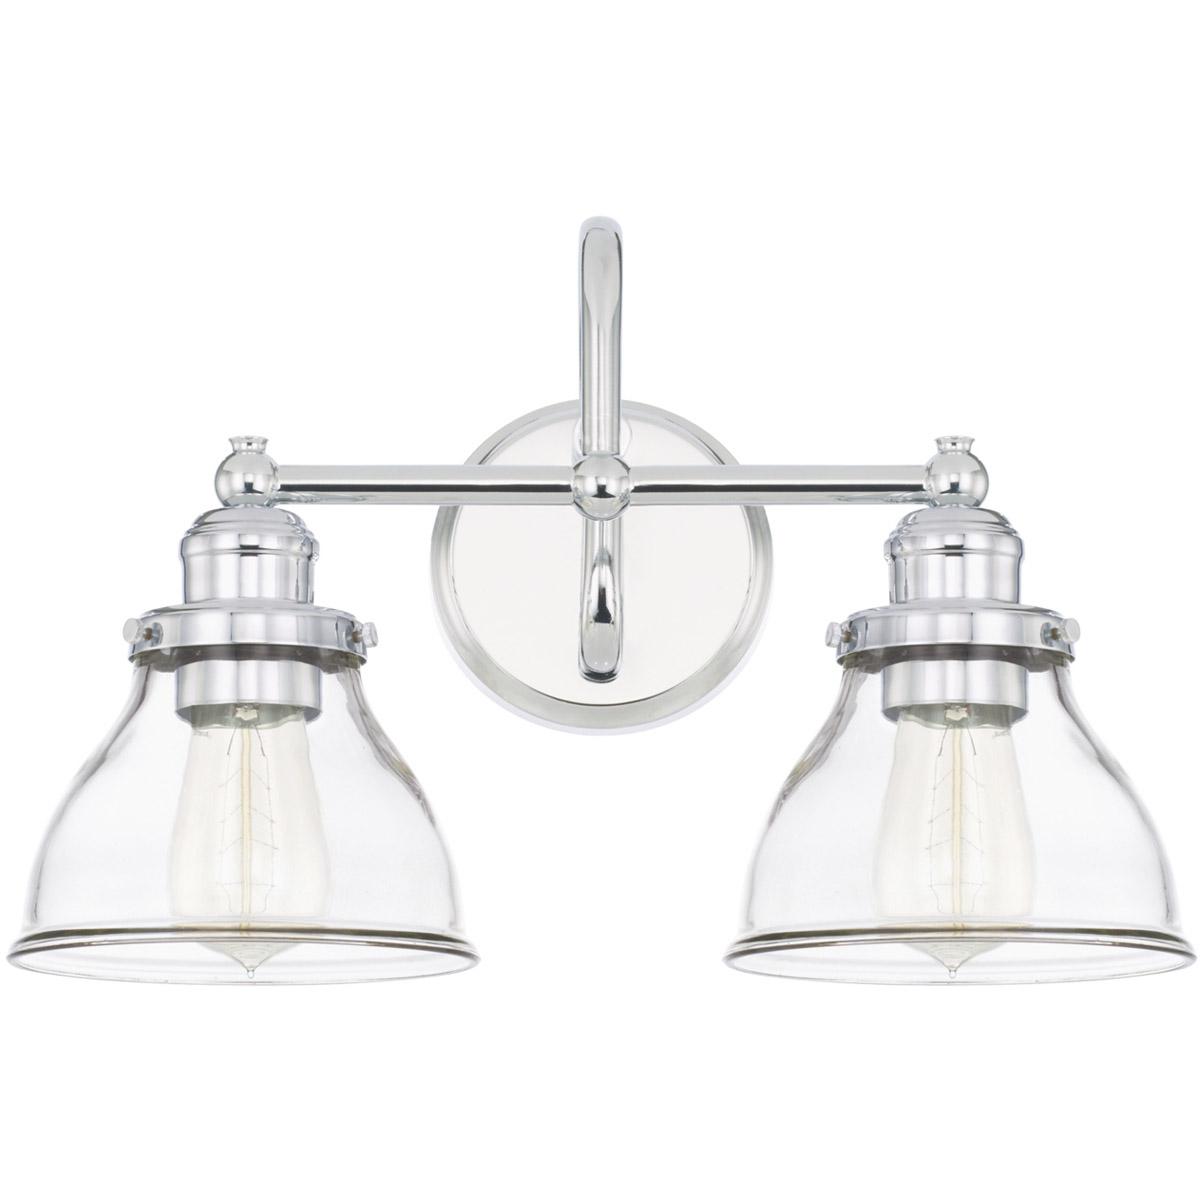 Capital lighting fixtures 8302ch 461 baxter bathroom vanity light chrome